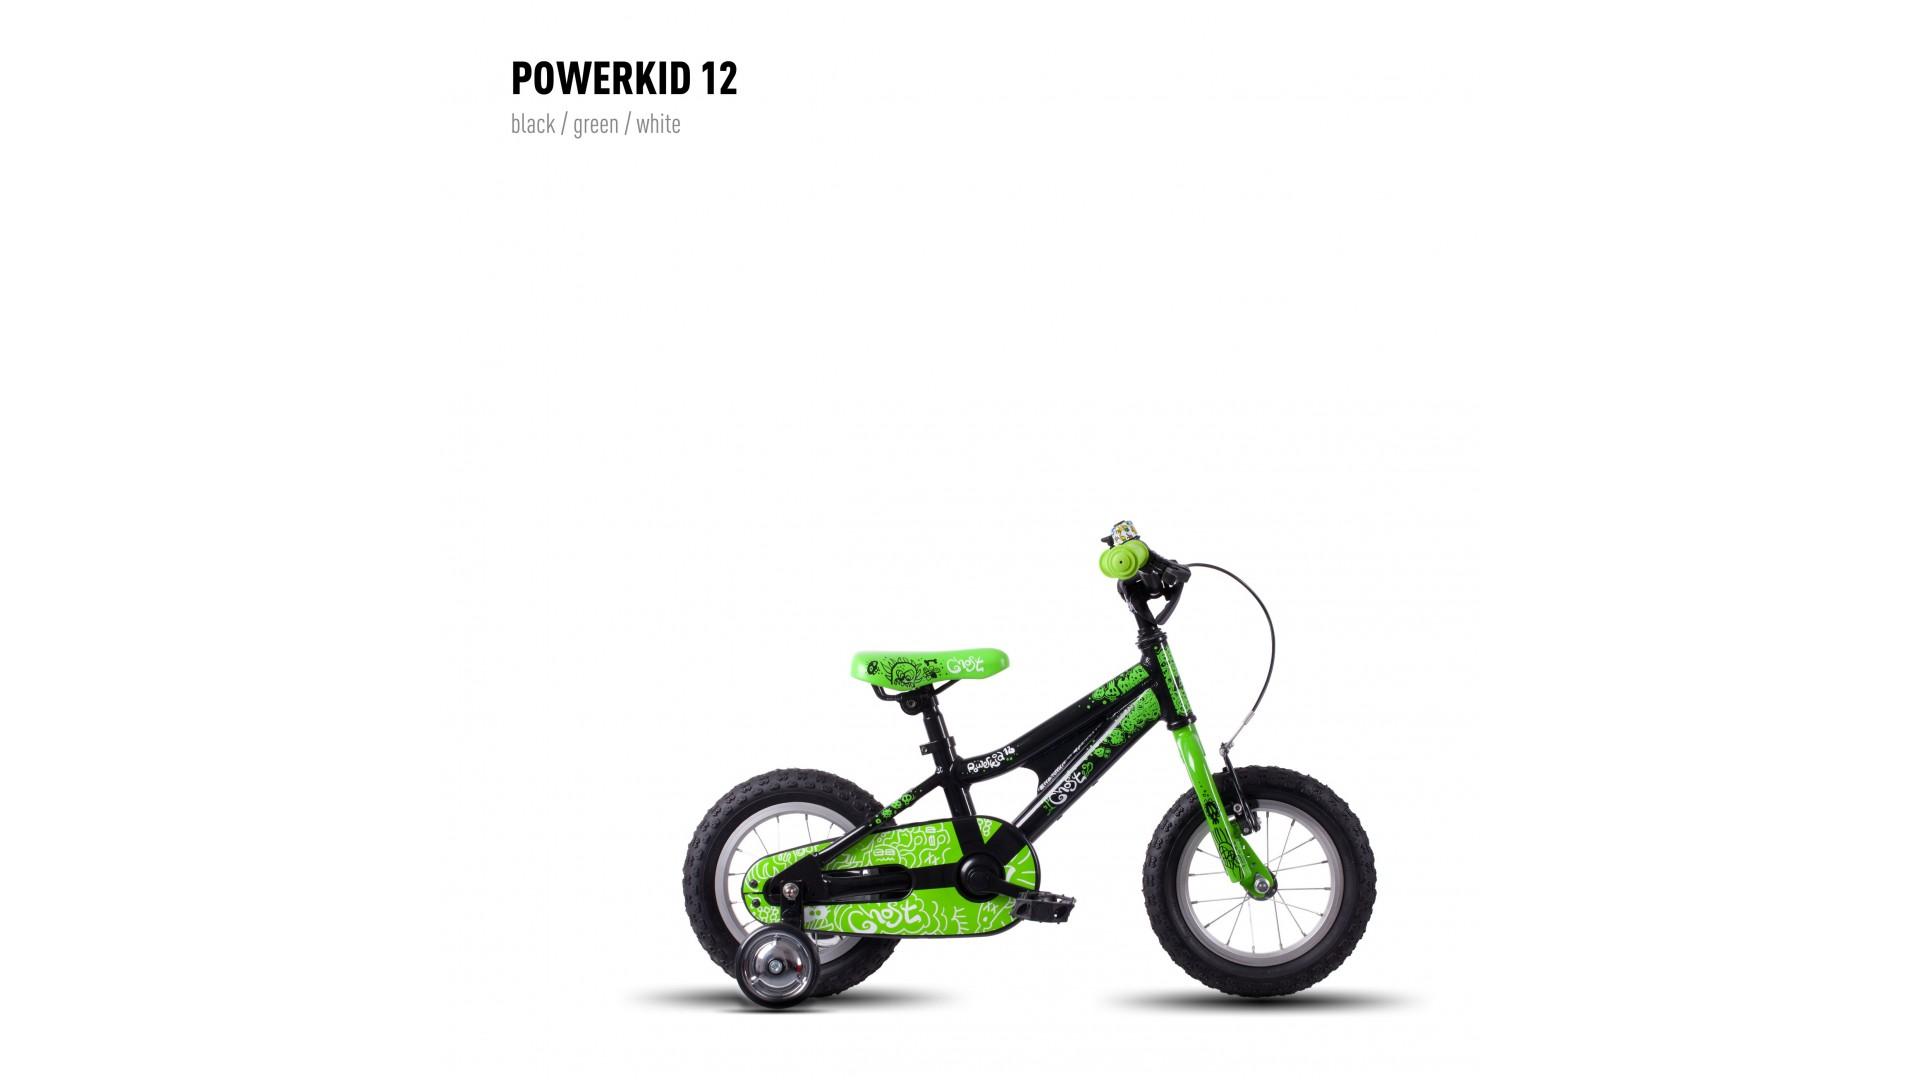 Велосипед GHOST Powerkiddy 12 black/green/white год 2016